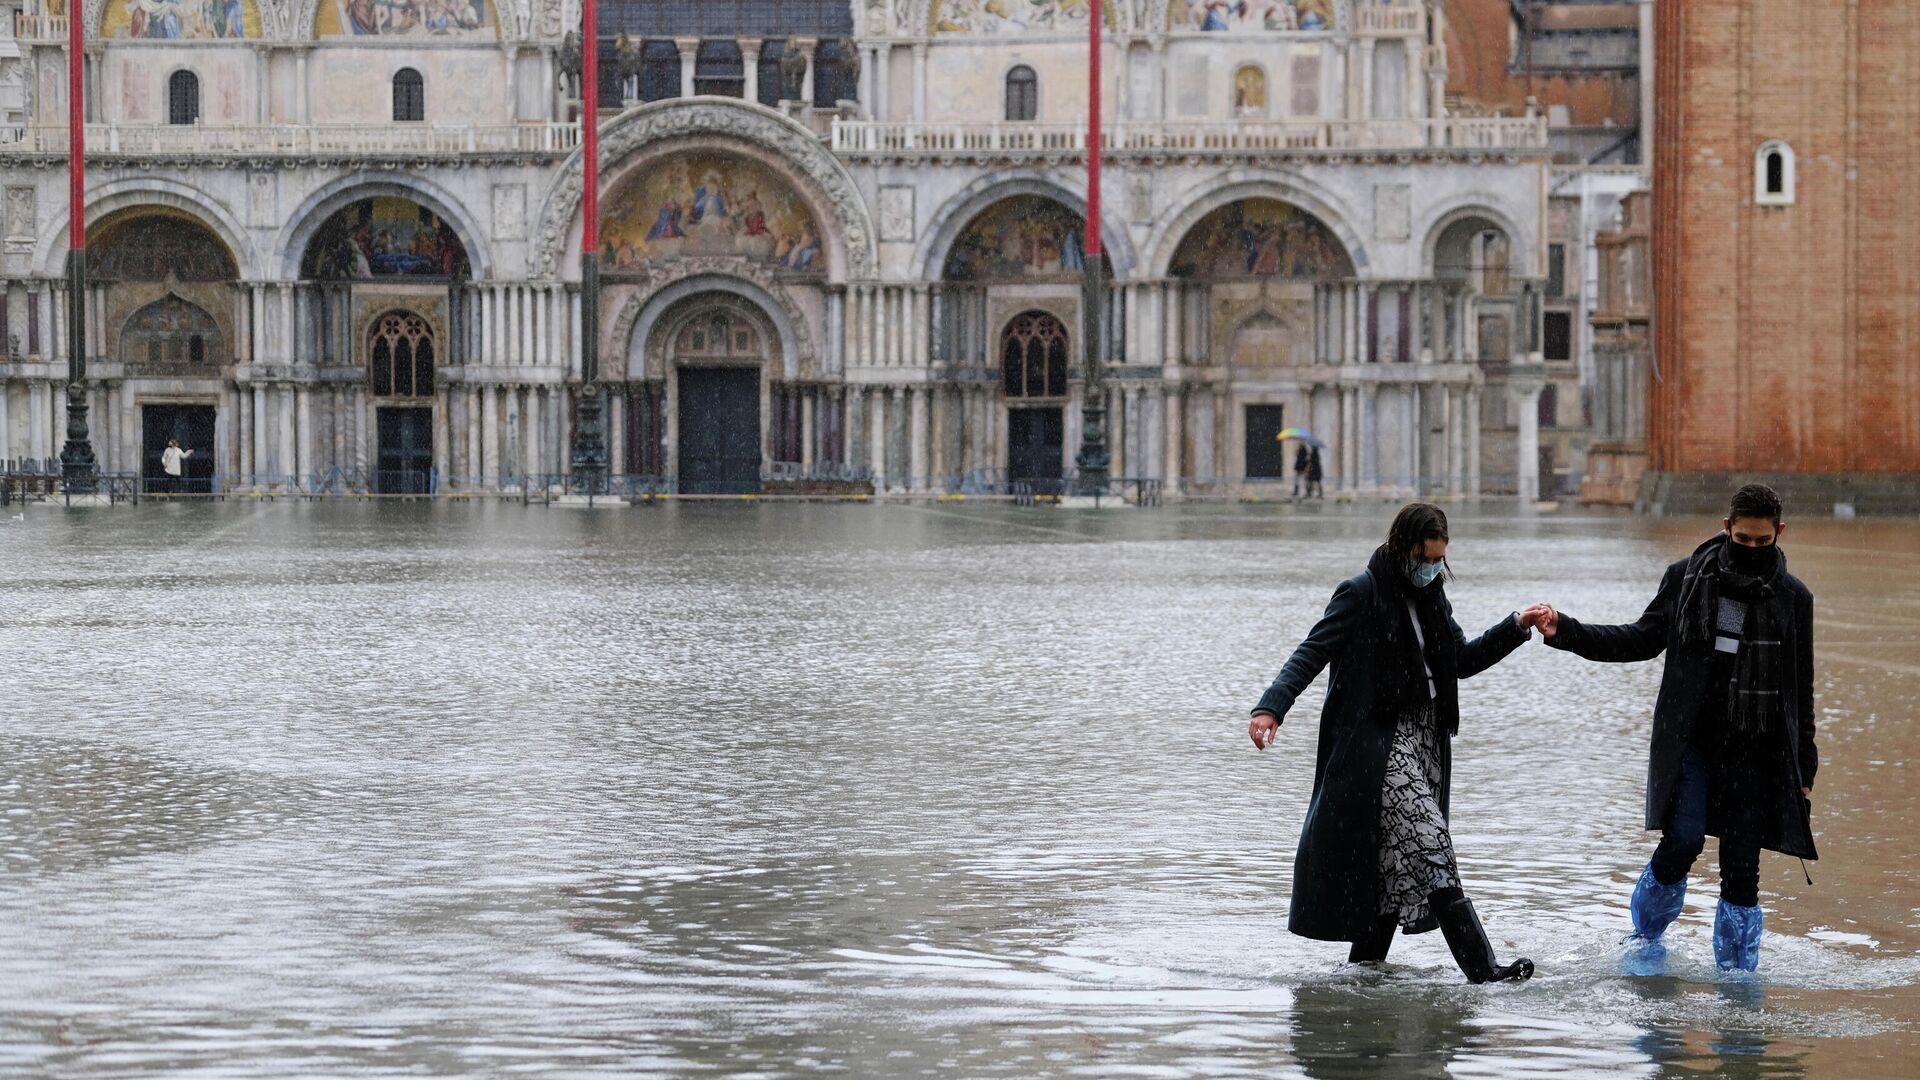 Пара на затопленной площади Святого Марка в Венеции - РИА Новости, 1920, 09.12.2020